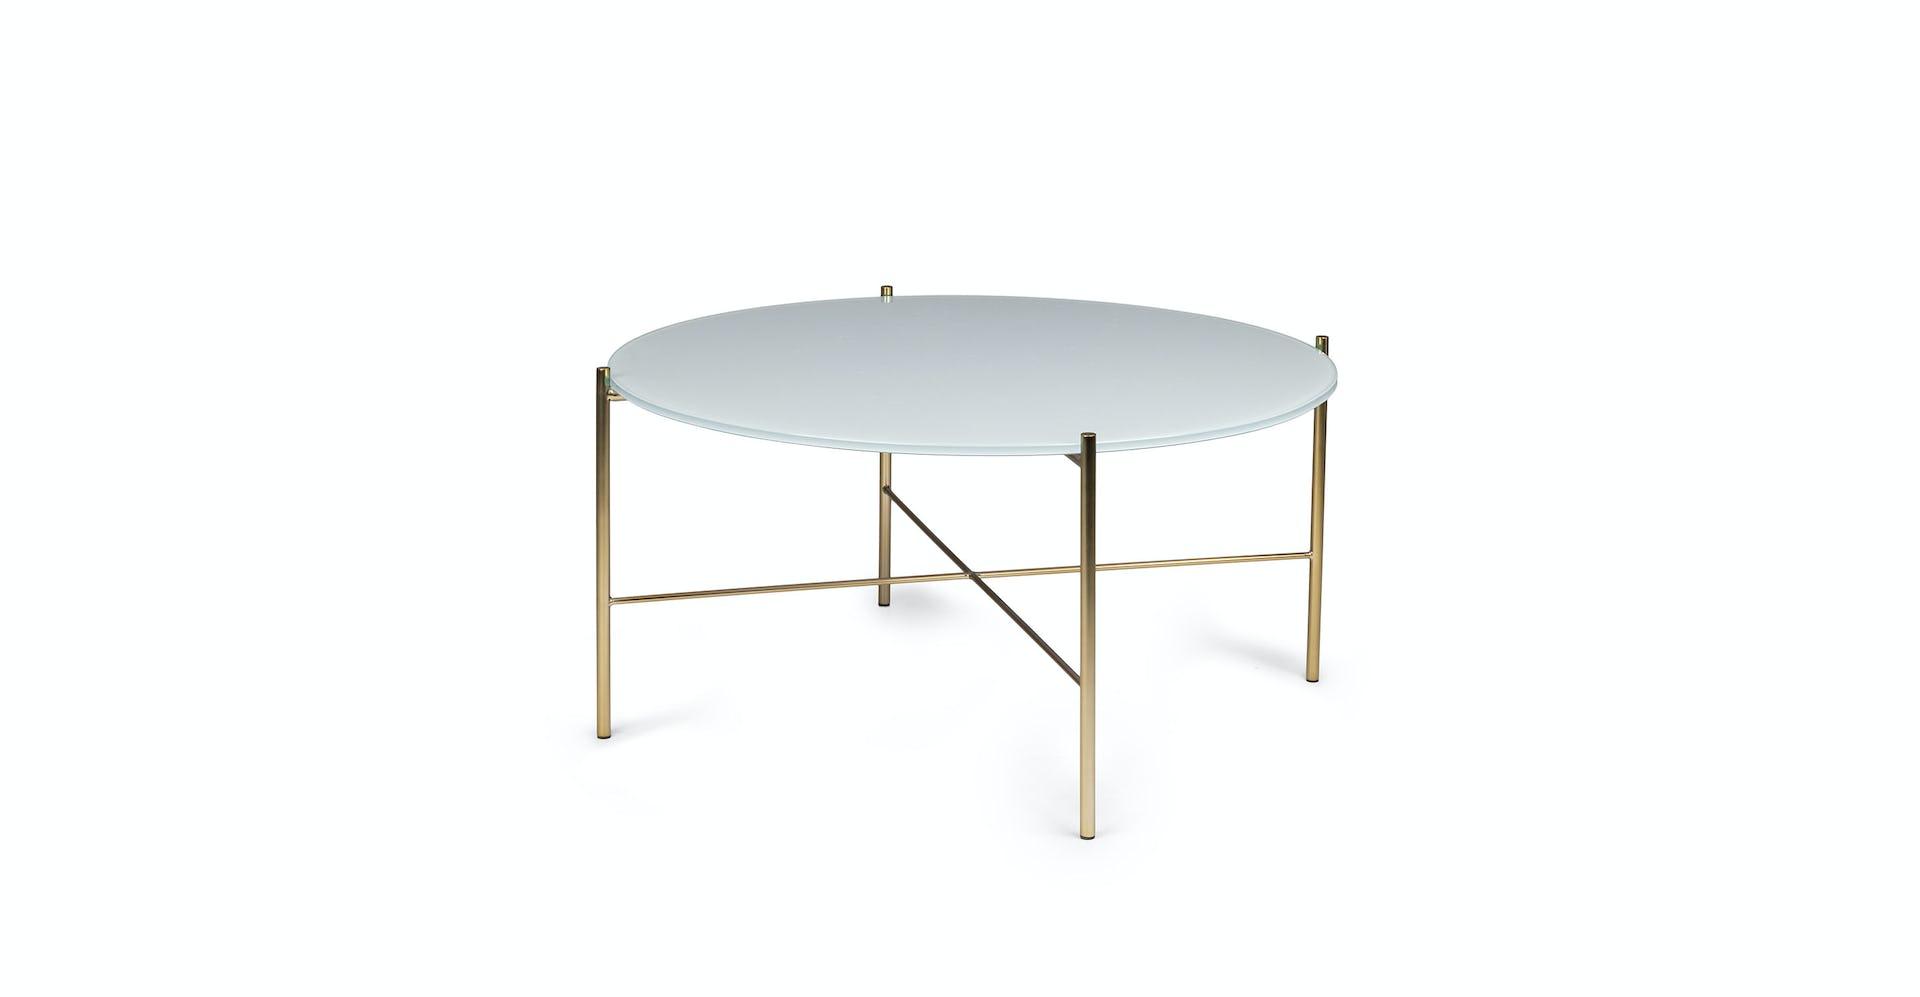 Strange Silicus Light Gray Round Coffee Table Lamtechconsult Wood Chair Design Ideas Lamtechconsultcom